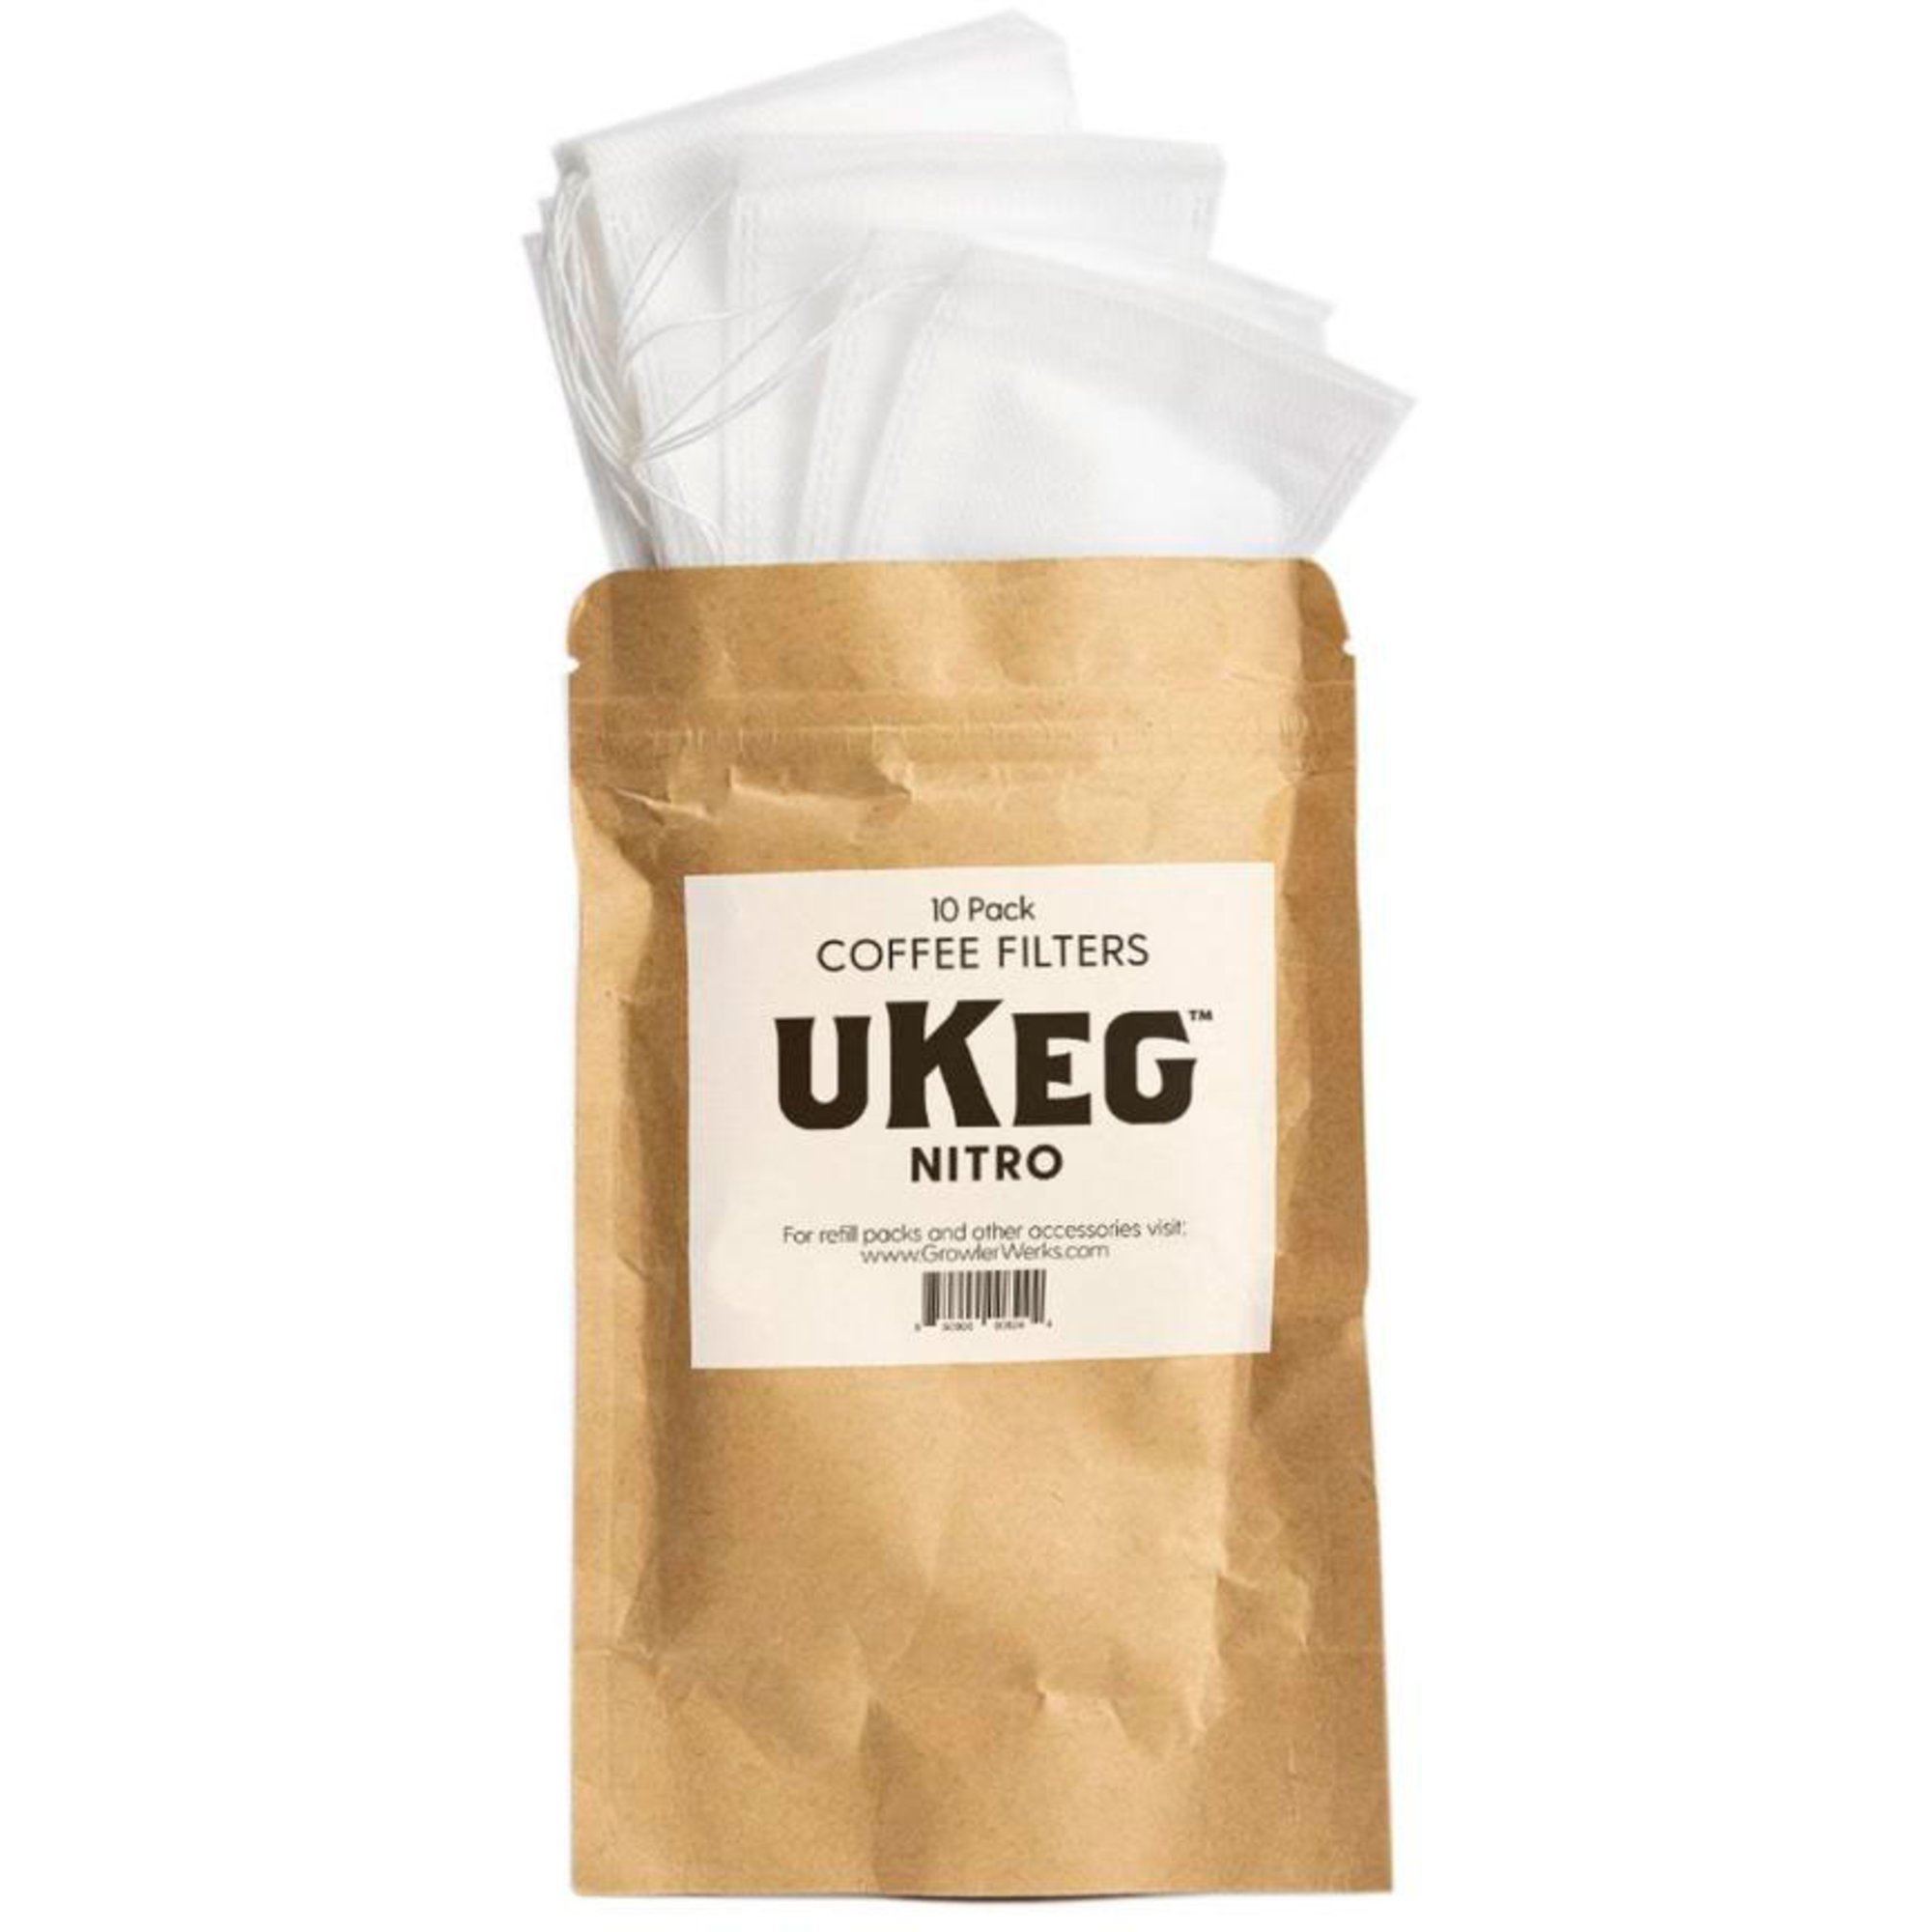 GrowlerWerks uKeg Nitro Kaffefilter (10-pack)